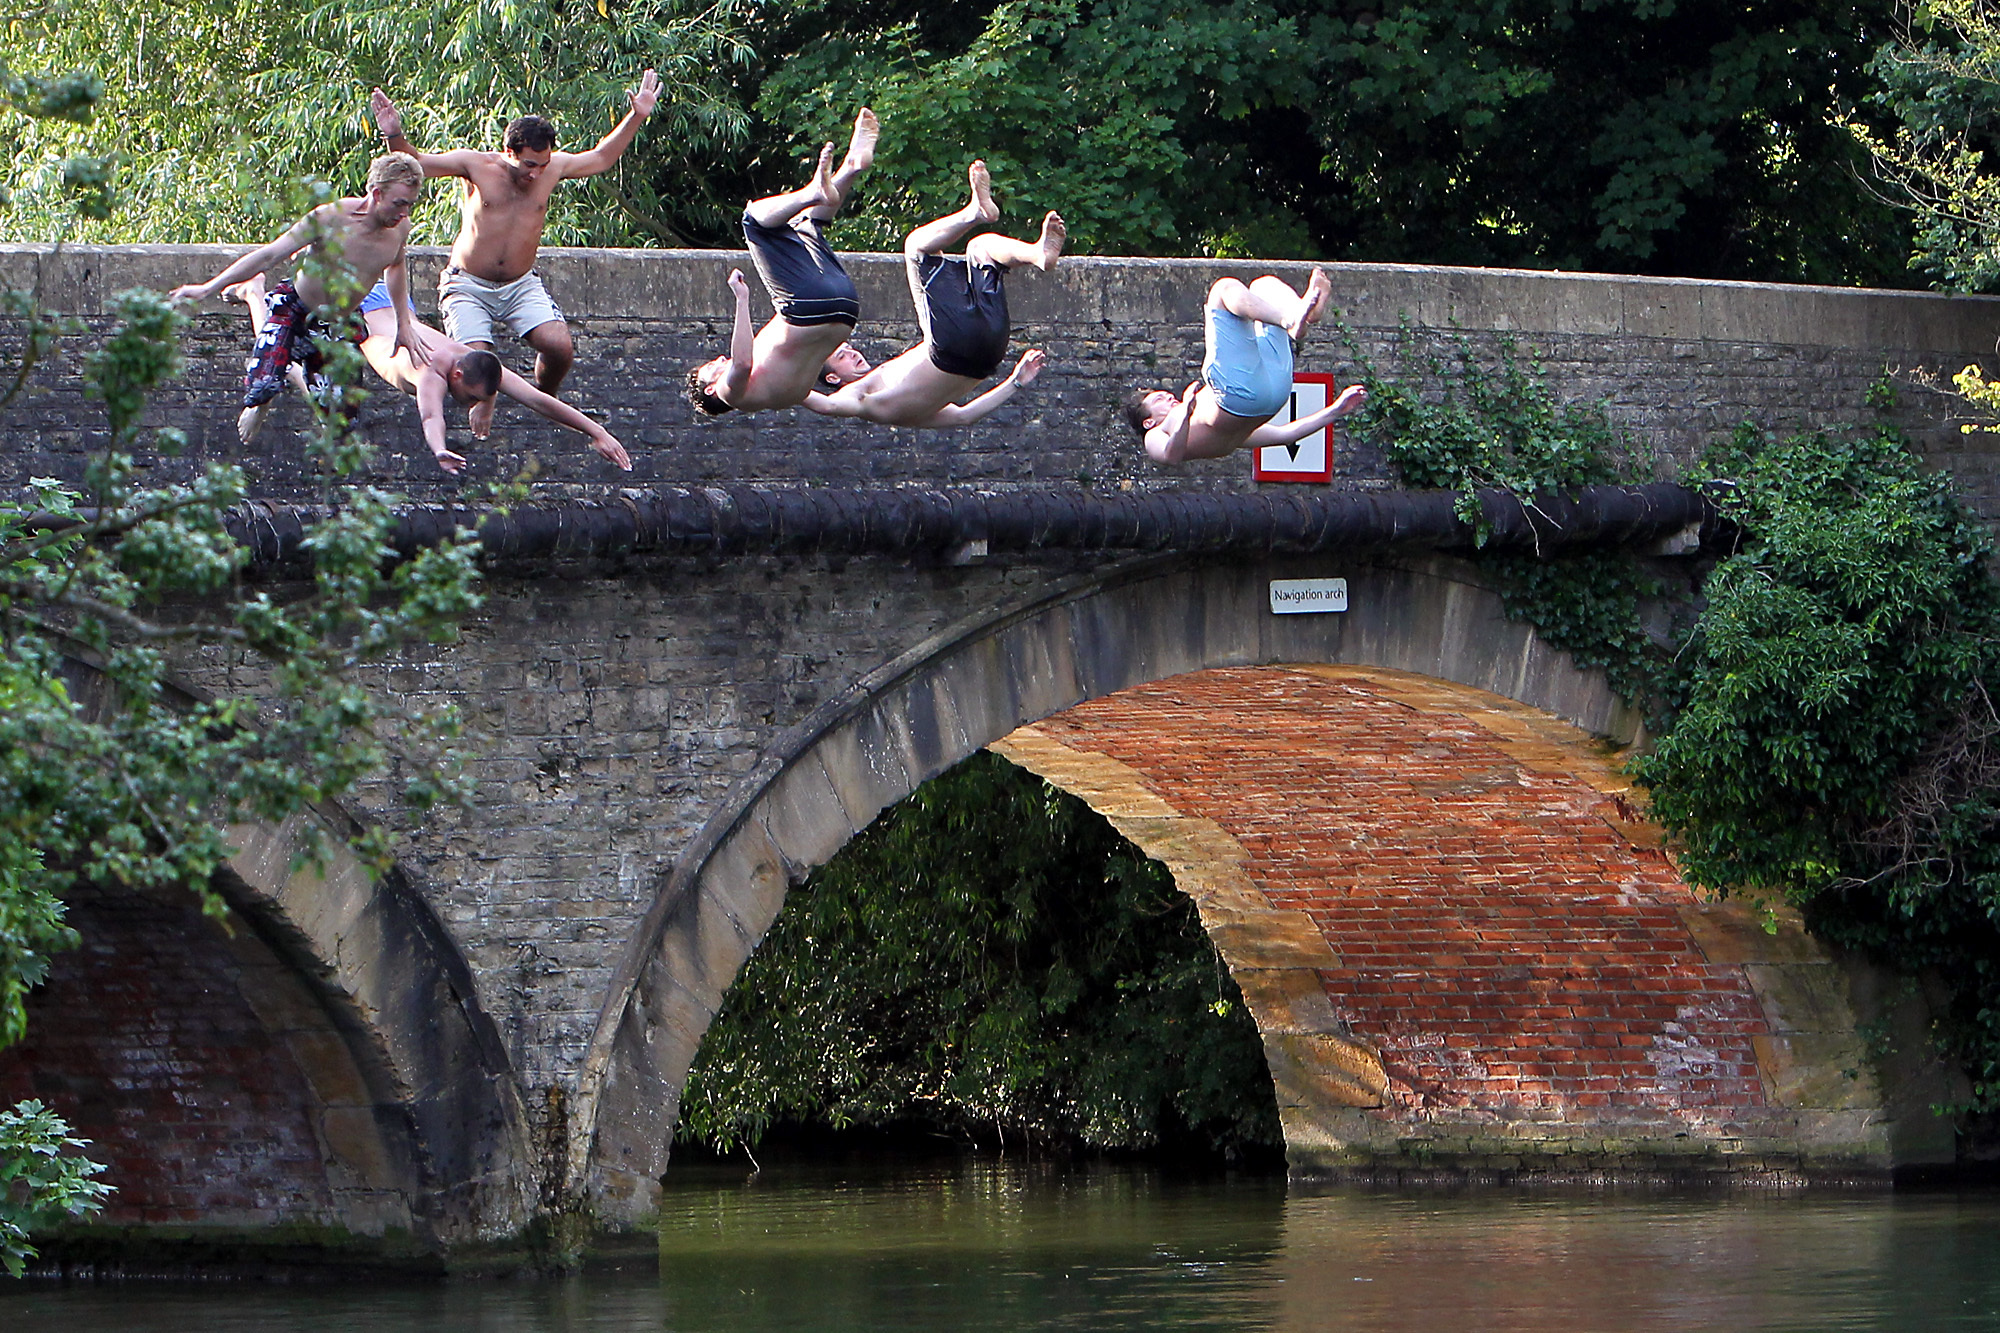 EA warn young people of 'hidden dangers' in River Thames